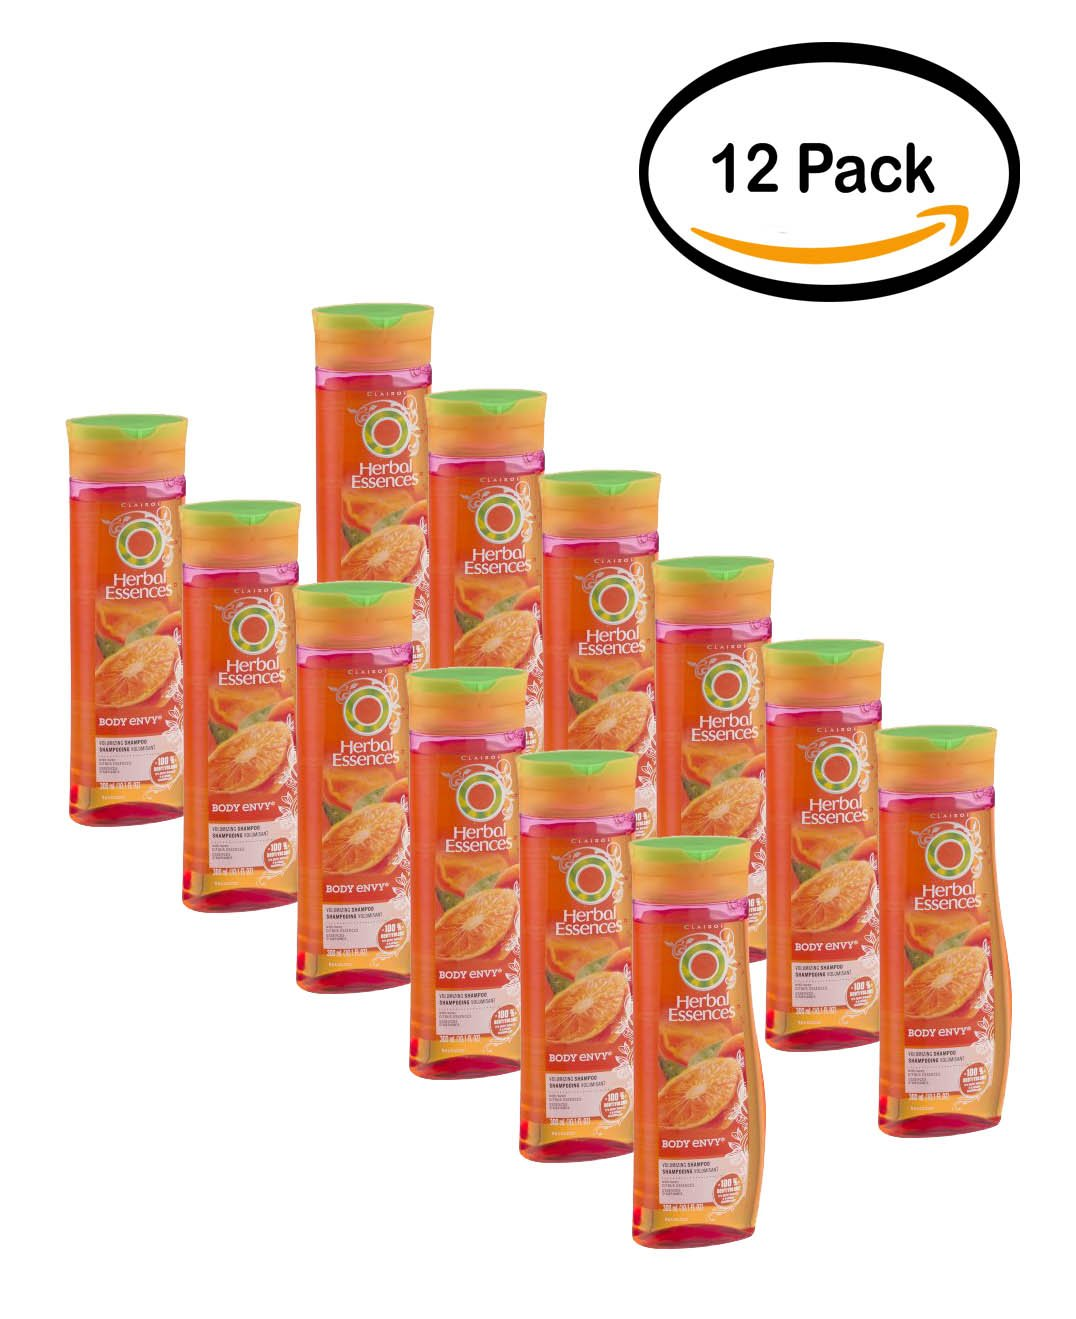 PACK OF 12 - Herbal Essences Body Envy Volumizing Shampoo, 10.1 fl oz by Herbal Essences